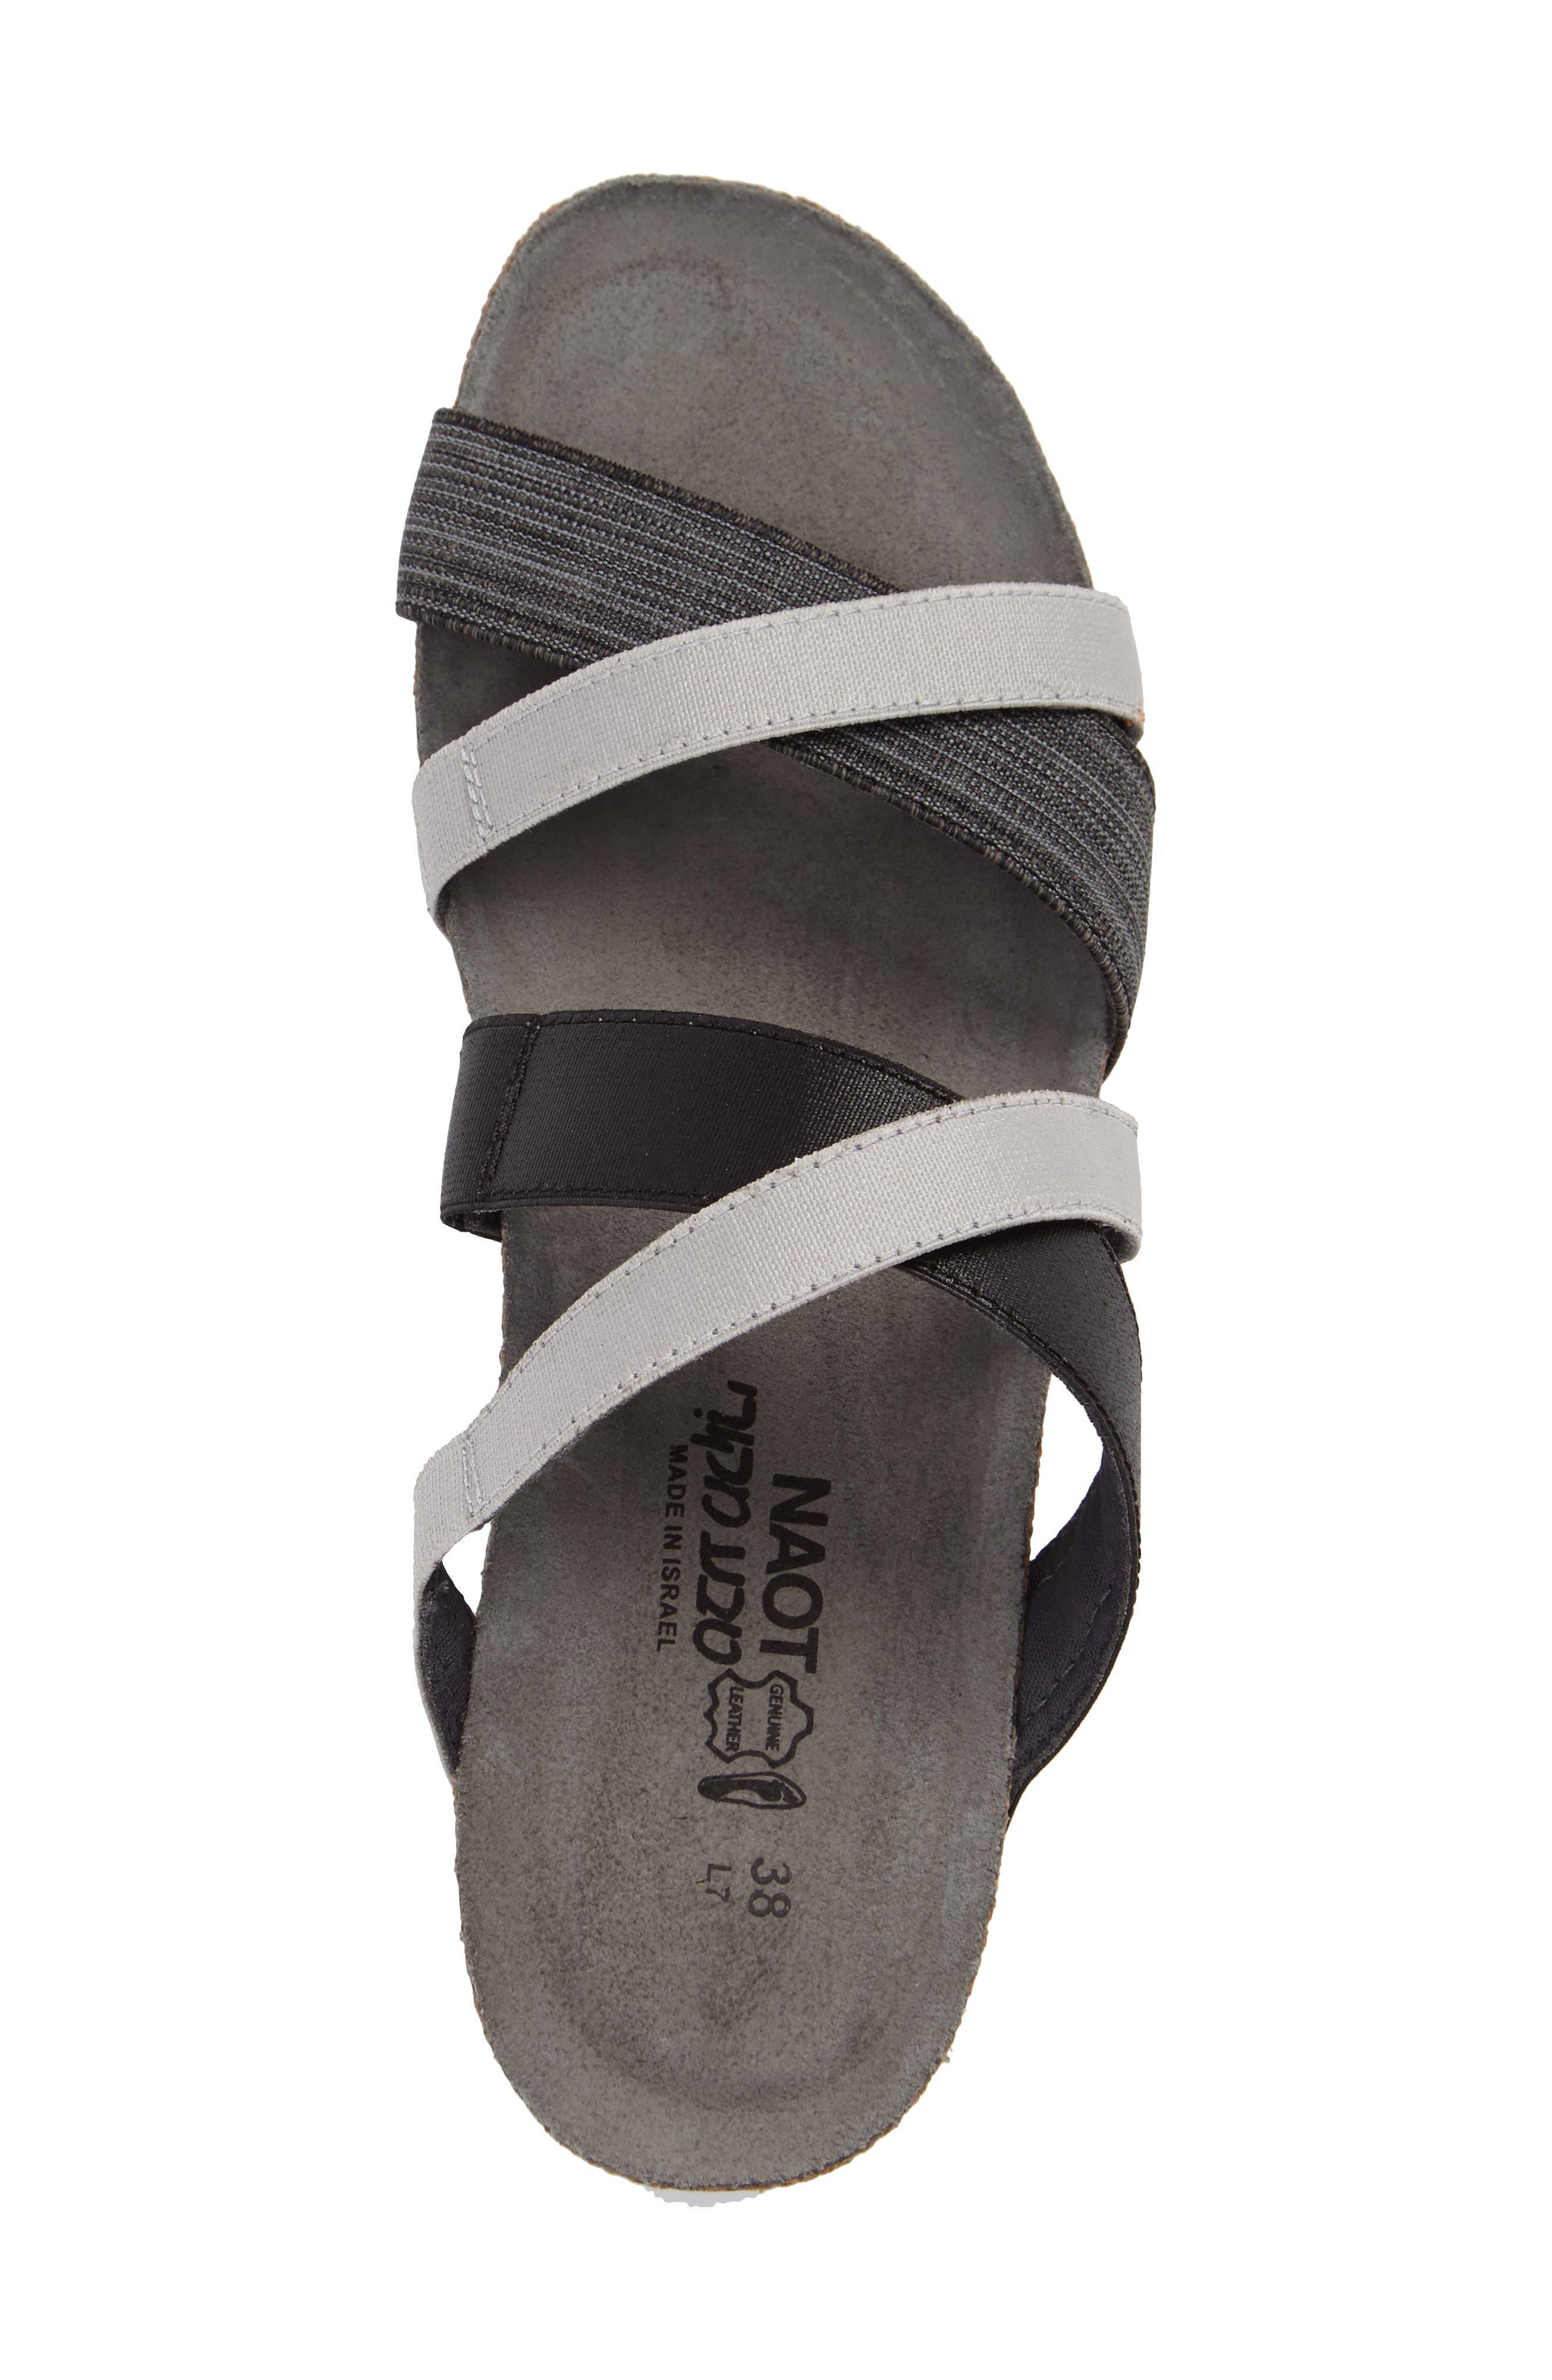 NAOT, Roxana Strappy Slip-On Sandal, Alternate thumbnail 3, color, BLACK/ GREY FABRIC